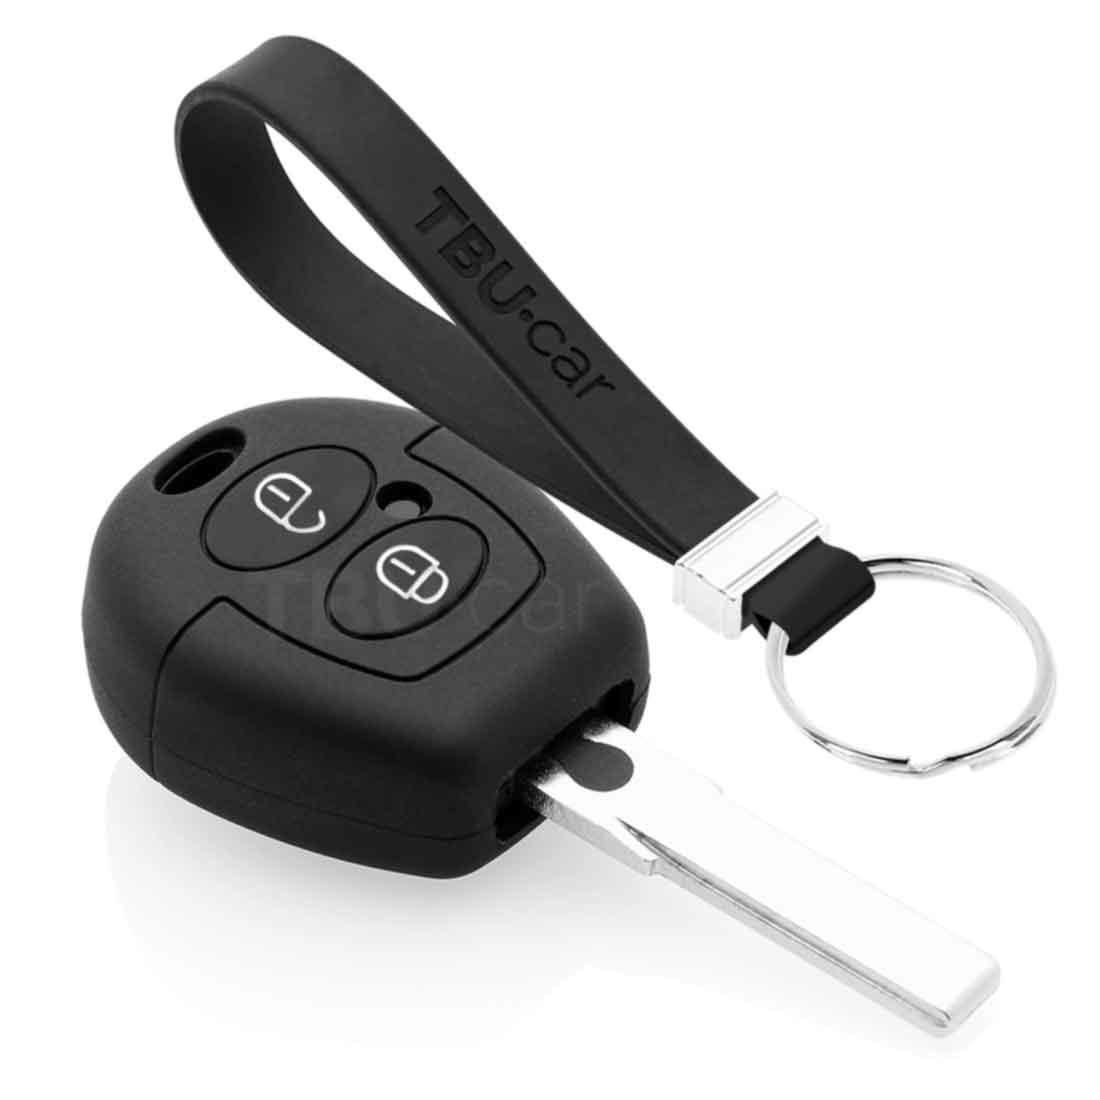 TBU car TBU car Autoschlüssel Hülle kompatibel mit Skoda 2 Tasten - Schutzhülle aus Silikon - Auto Schlüsselhülle Cover in Schwarz